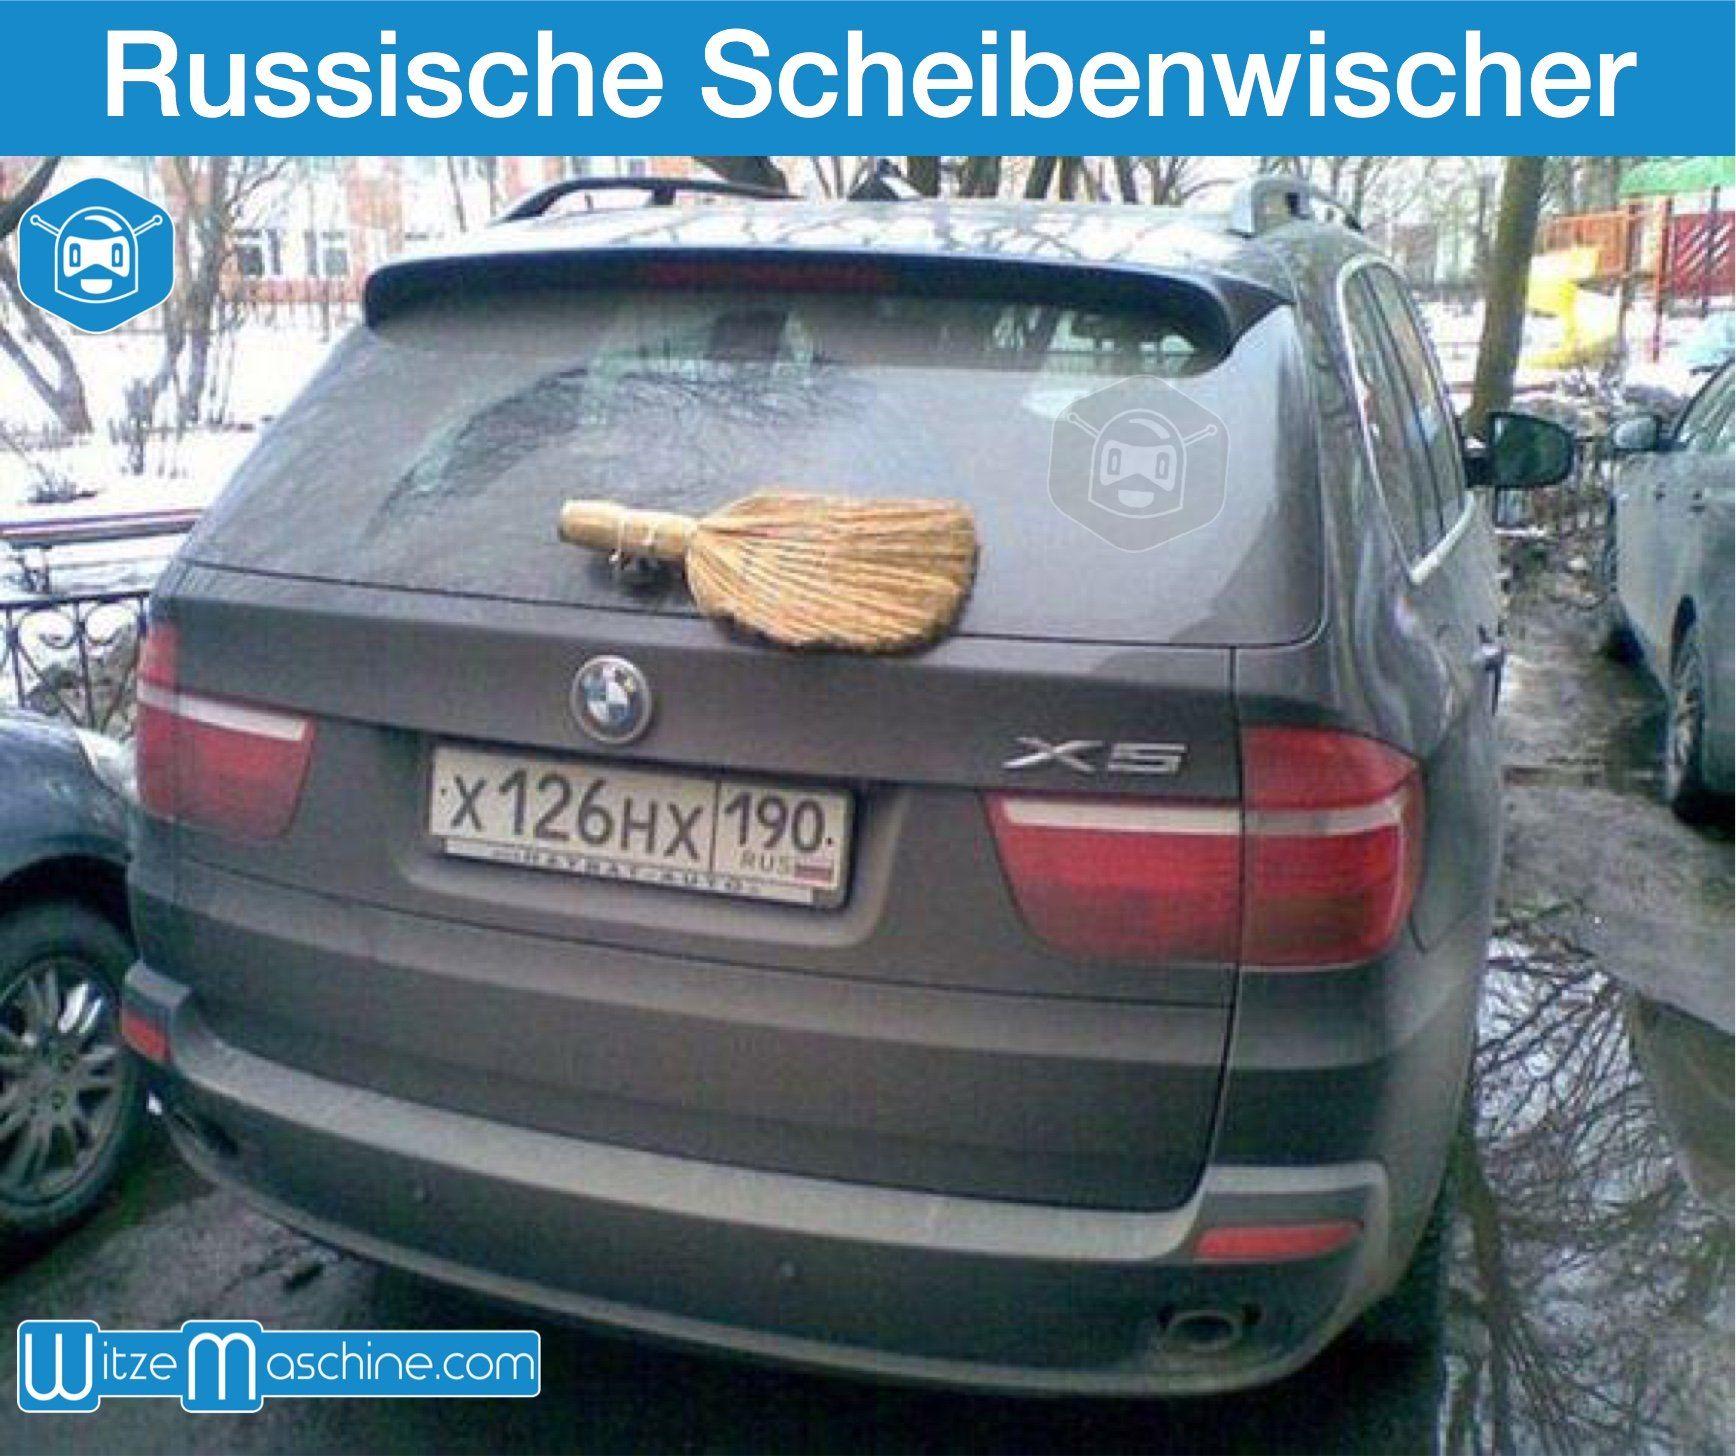 Scheibenwischer in Russland - Russenwitze - Funny Russian ...